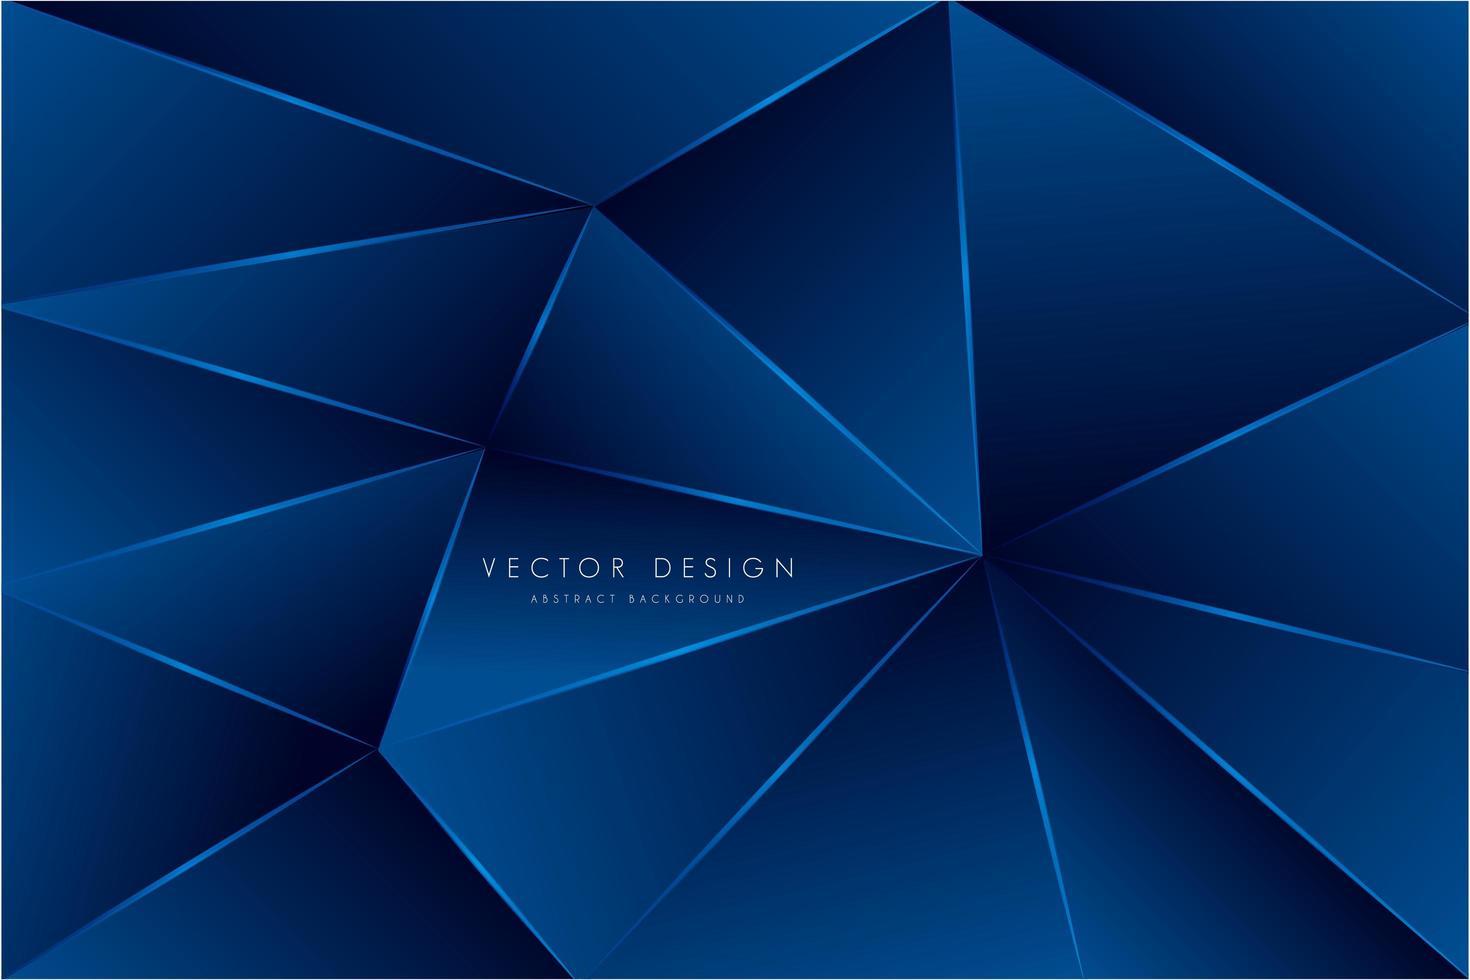 metallisk blå polygon design vektor